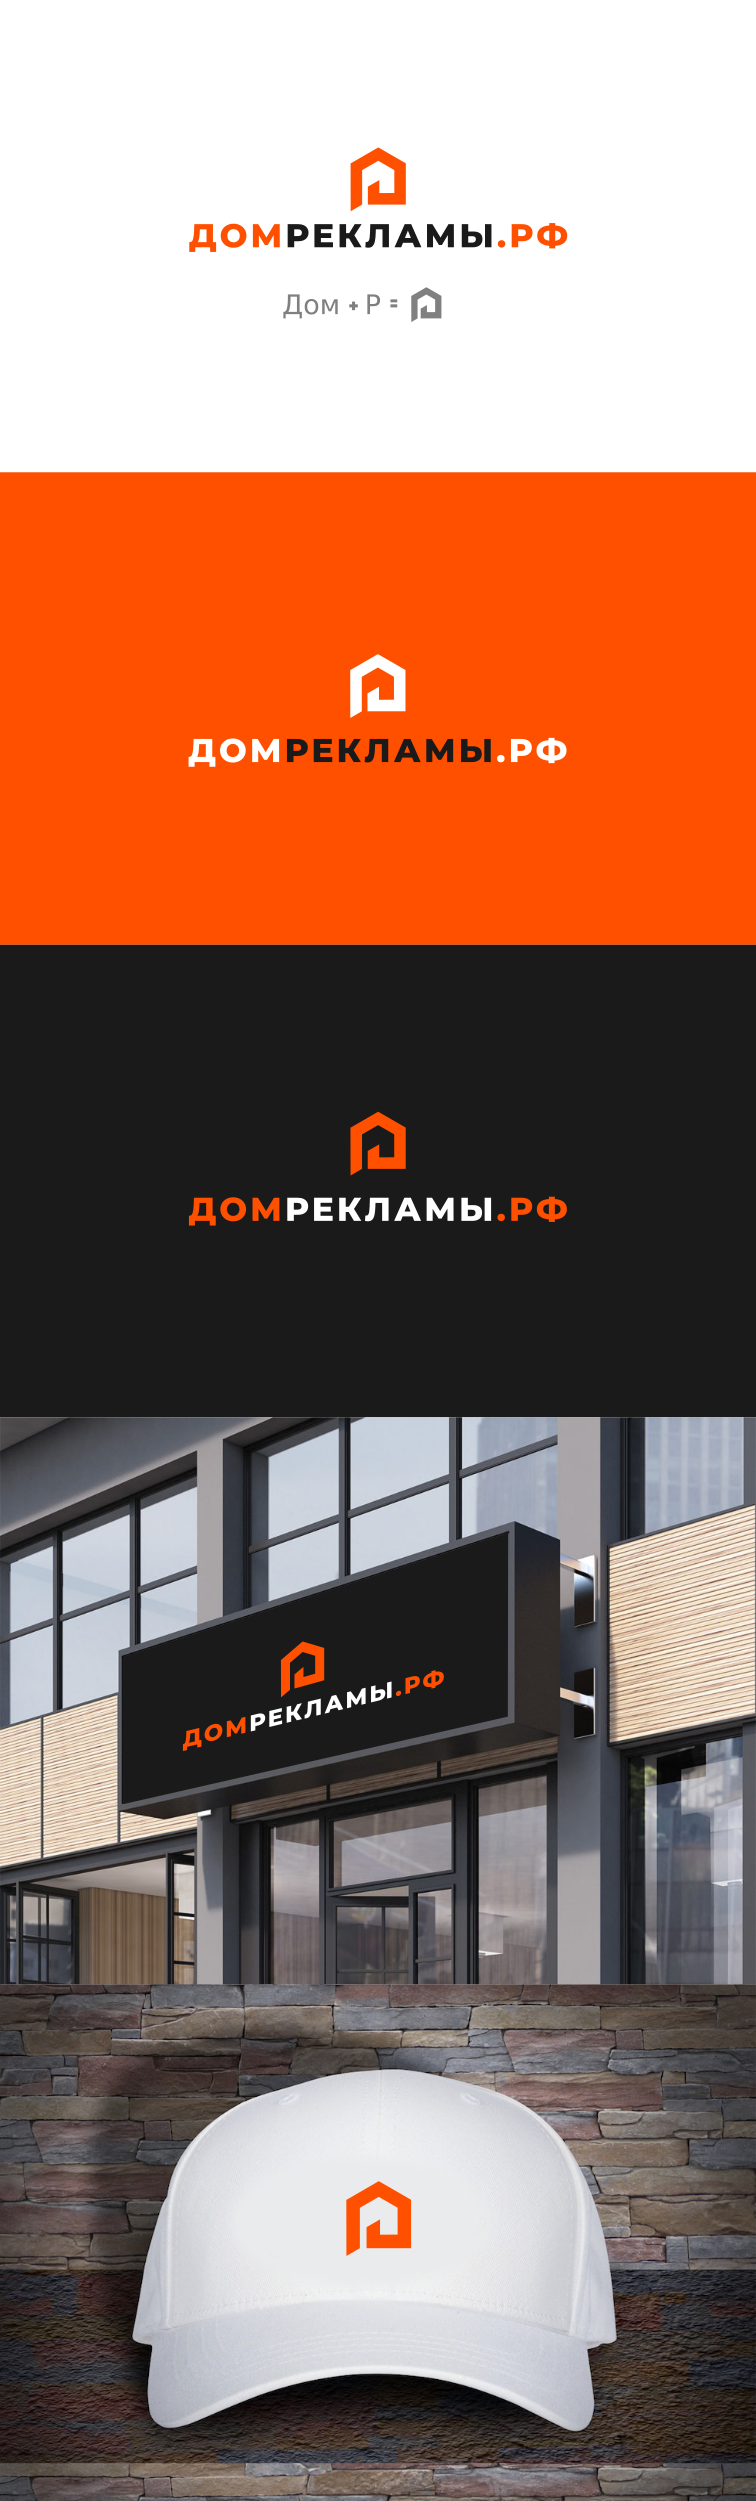 Дизайн логотипа рекламно-производственной компании фото f_4305eddf8320695f.png